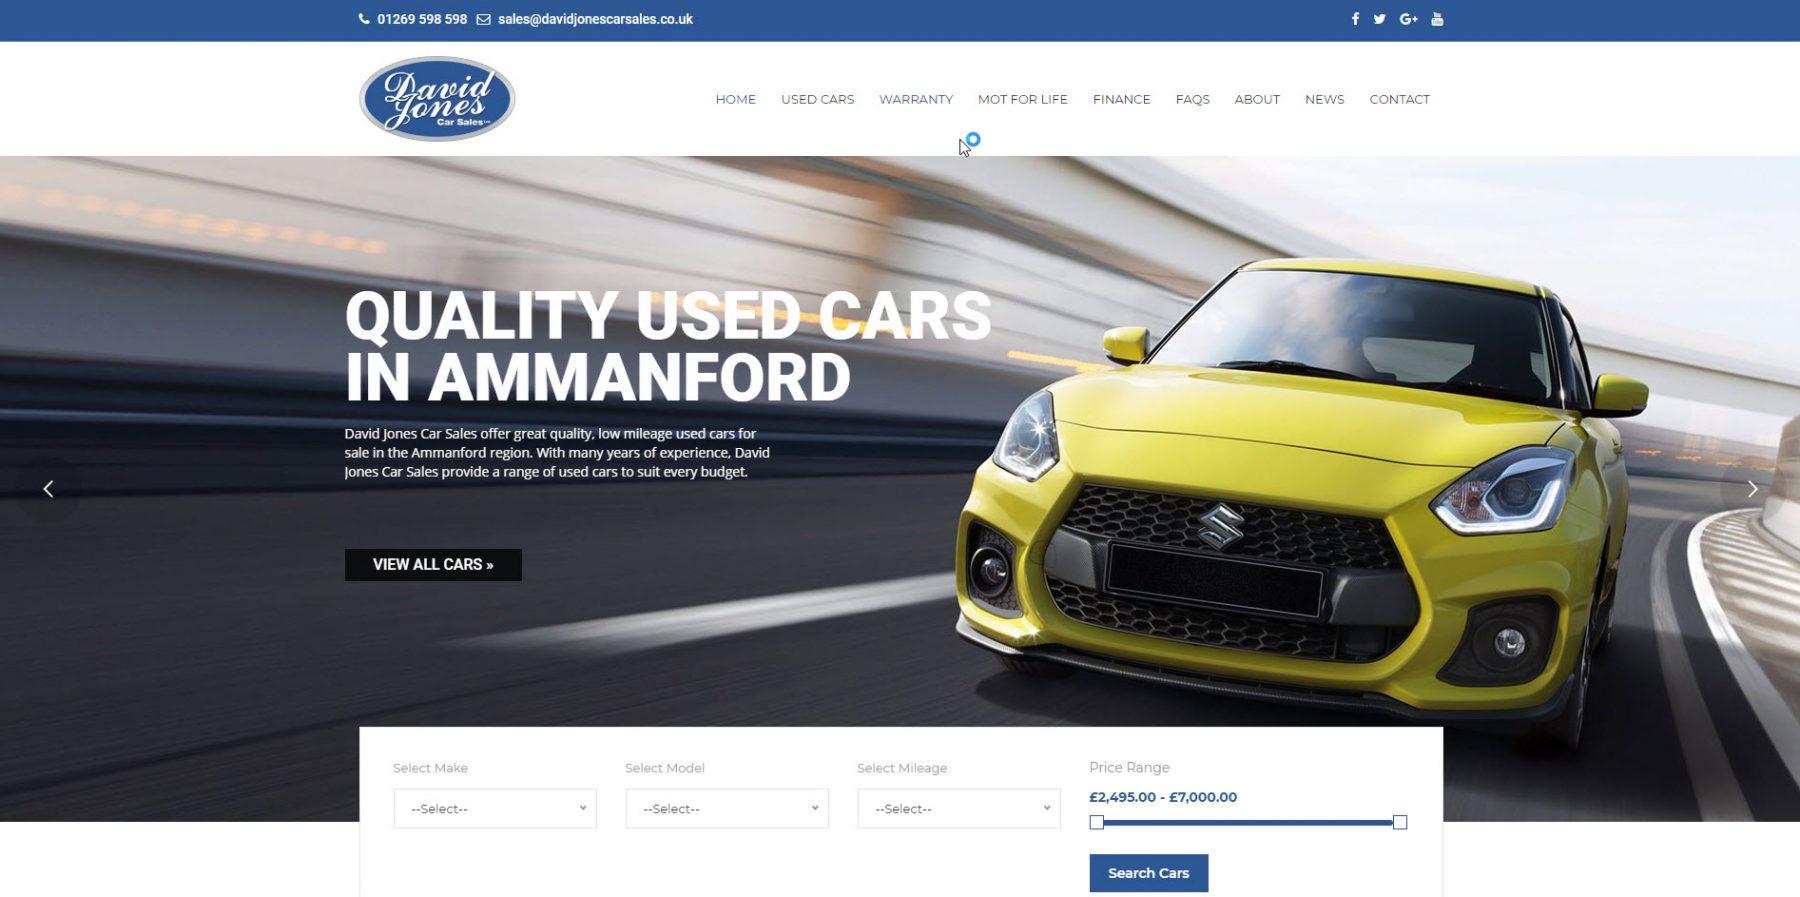 used cars for sale, ammanford, carmarthenshire - david jones car sales